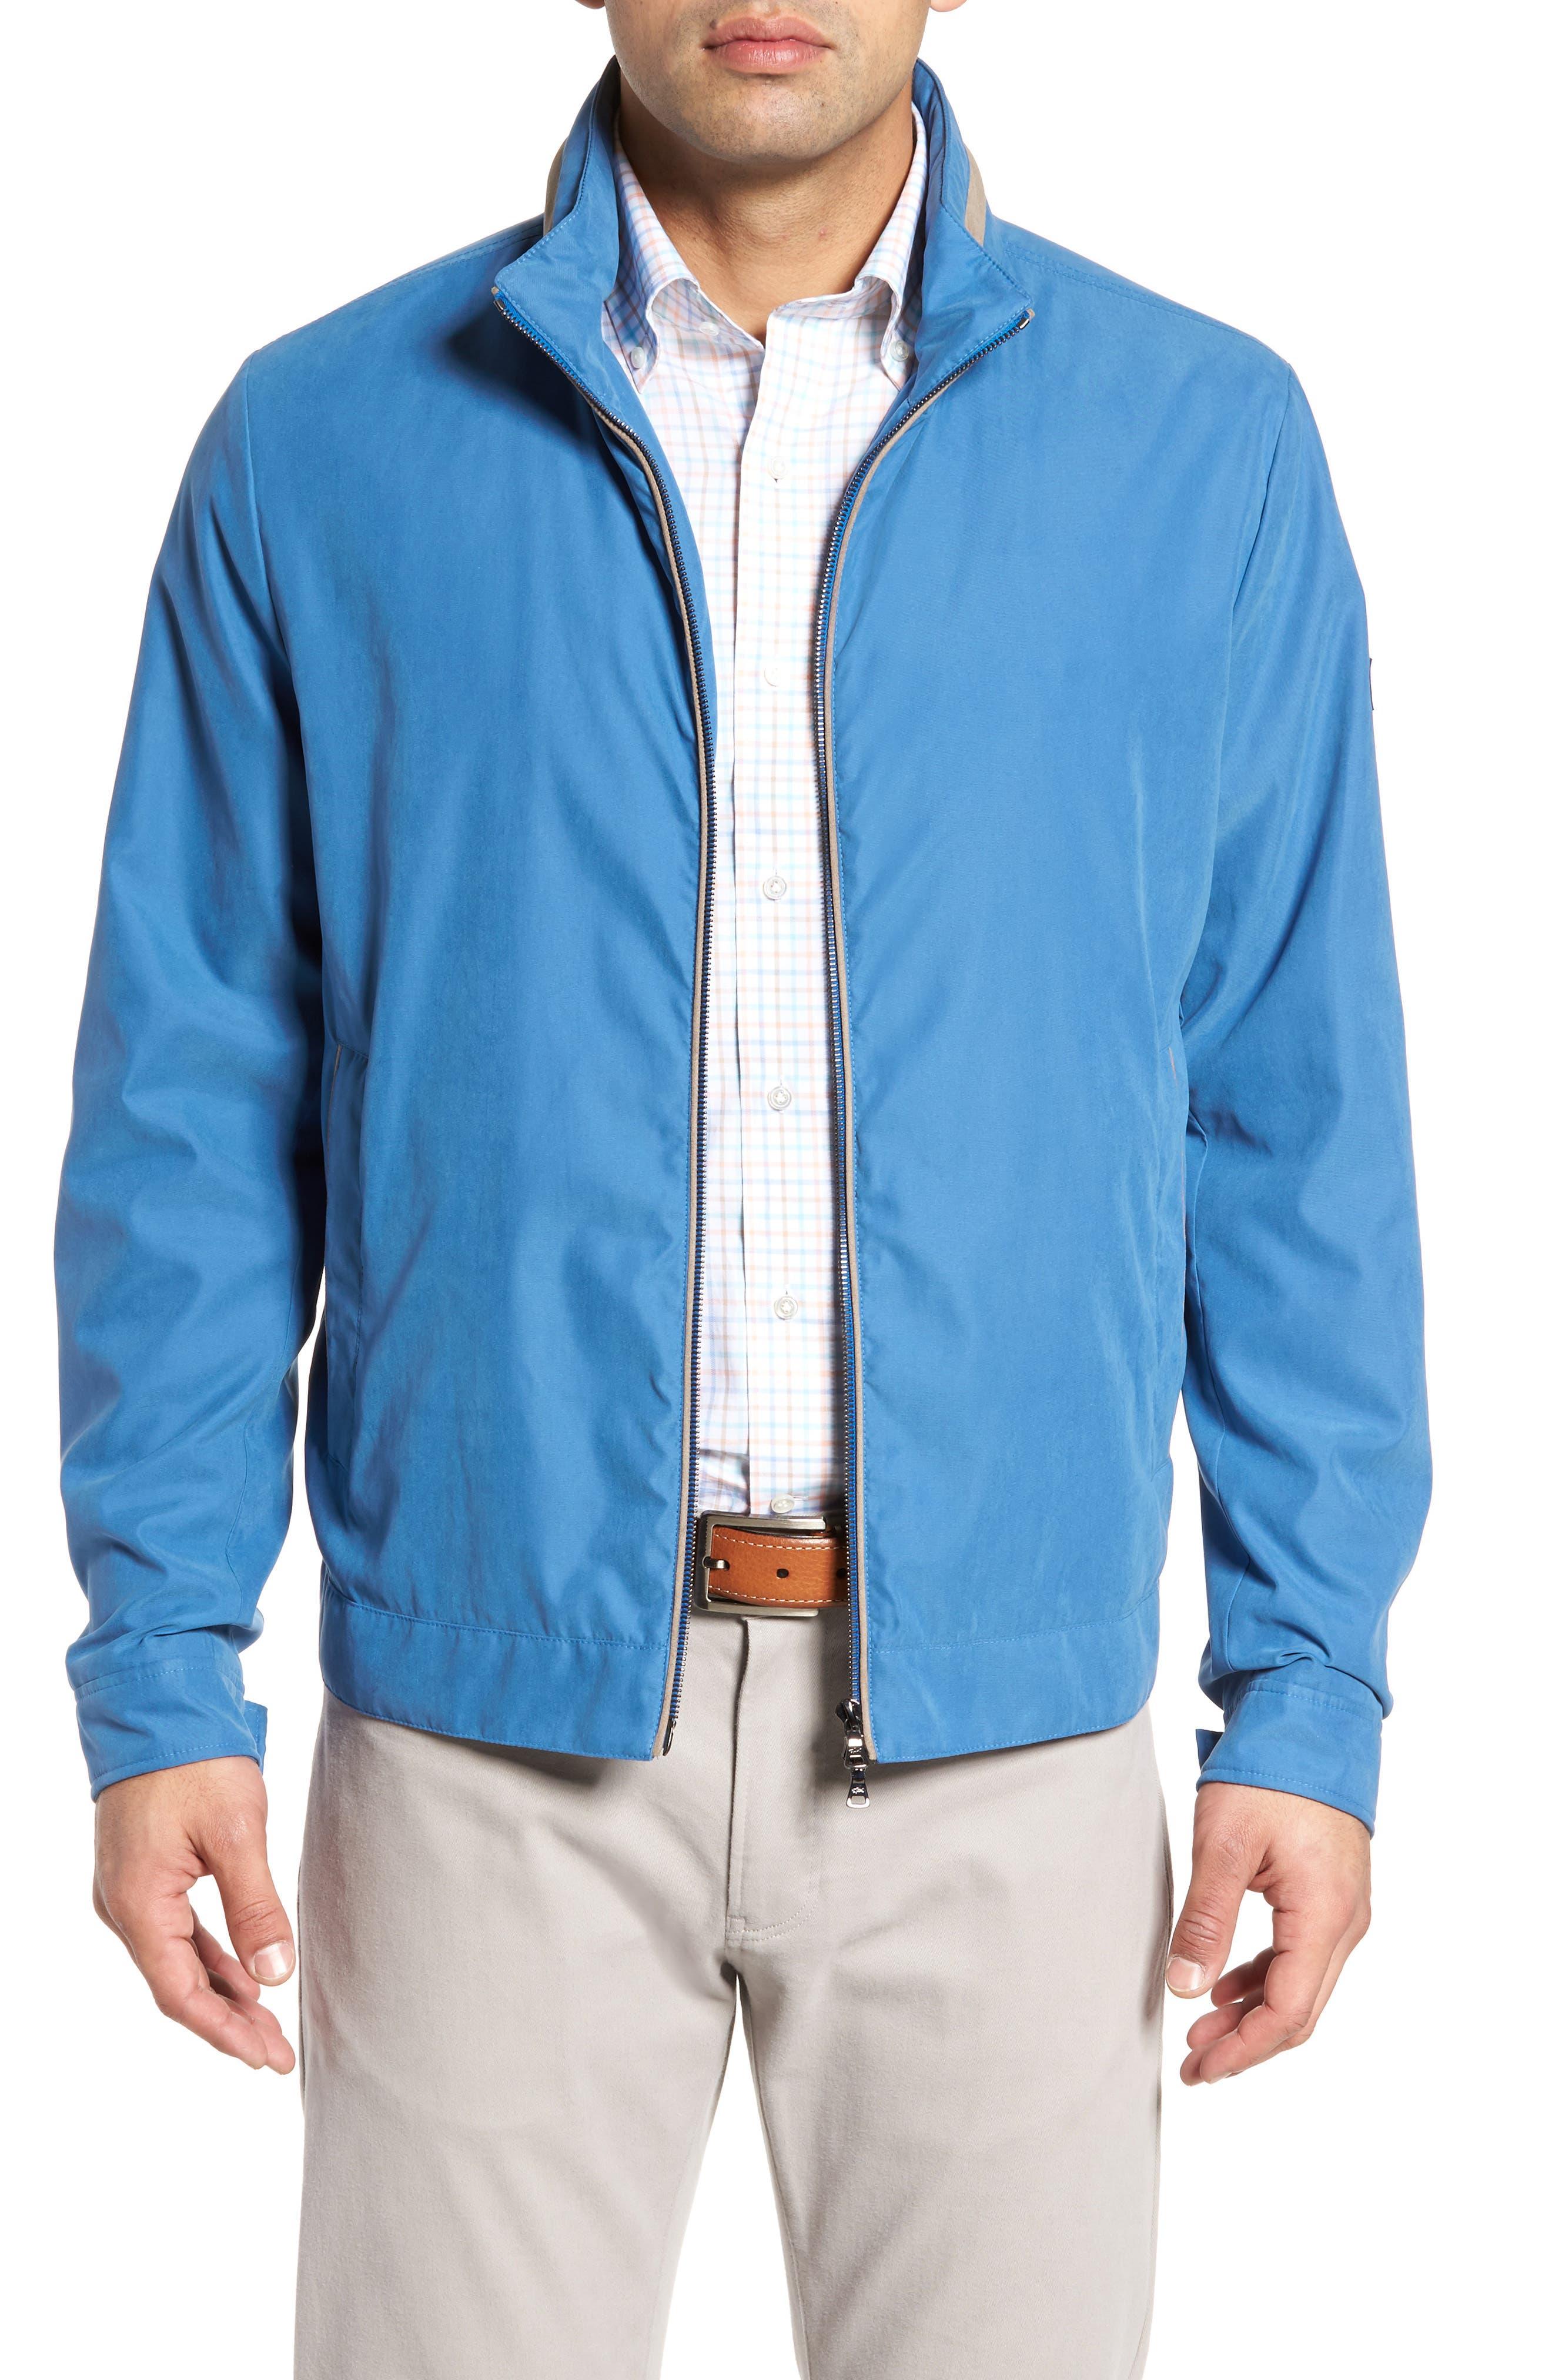 Paul&Shark Water Repellent Microfiber Jacket,                         Main,                         color, 405